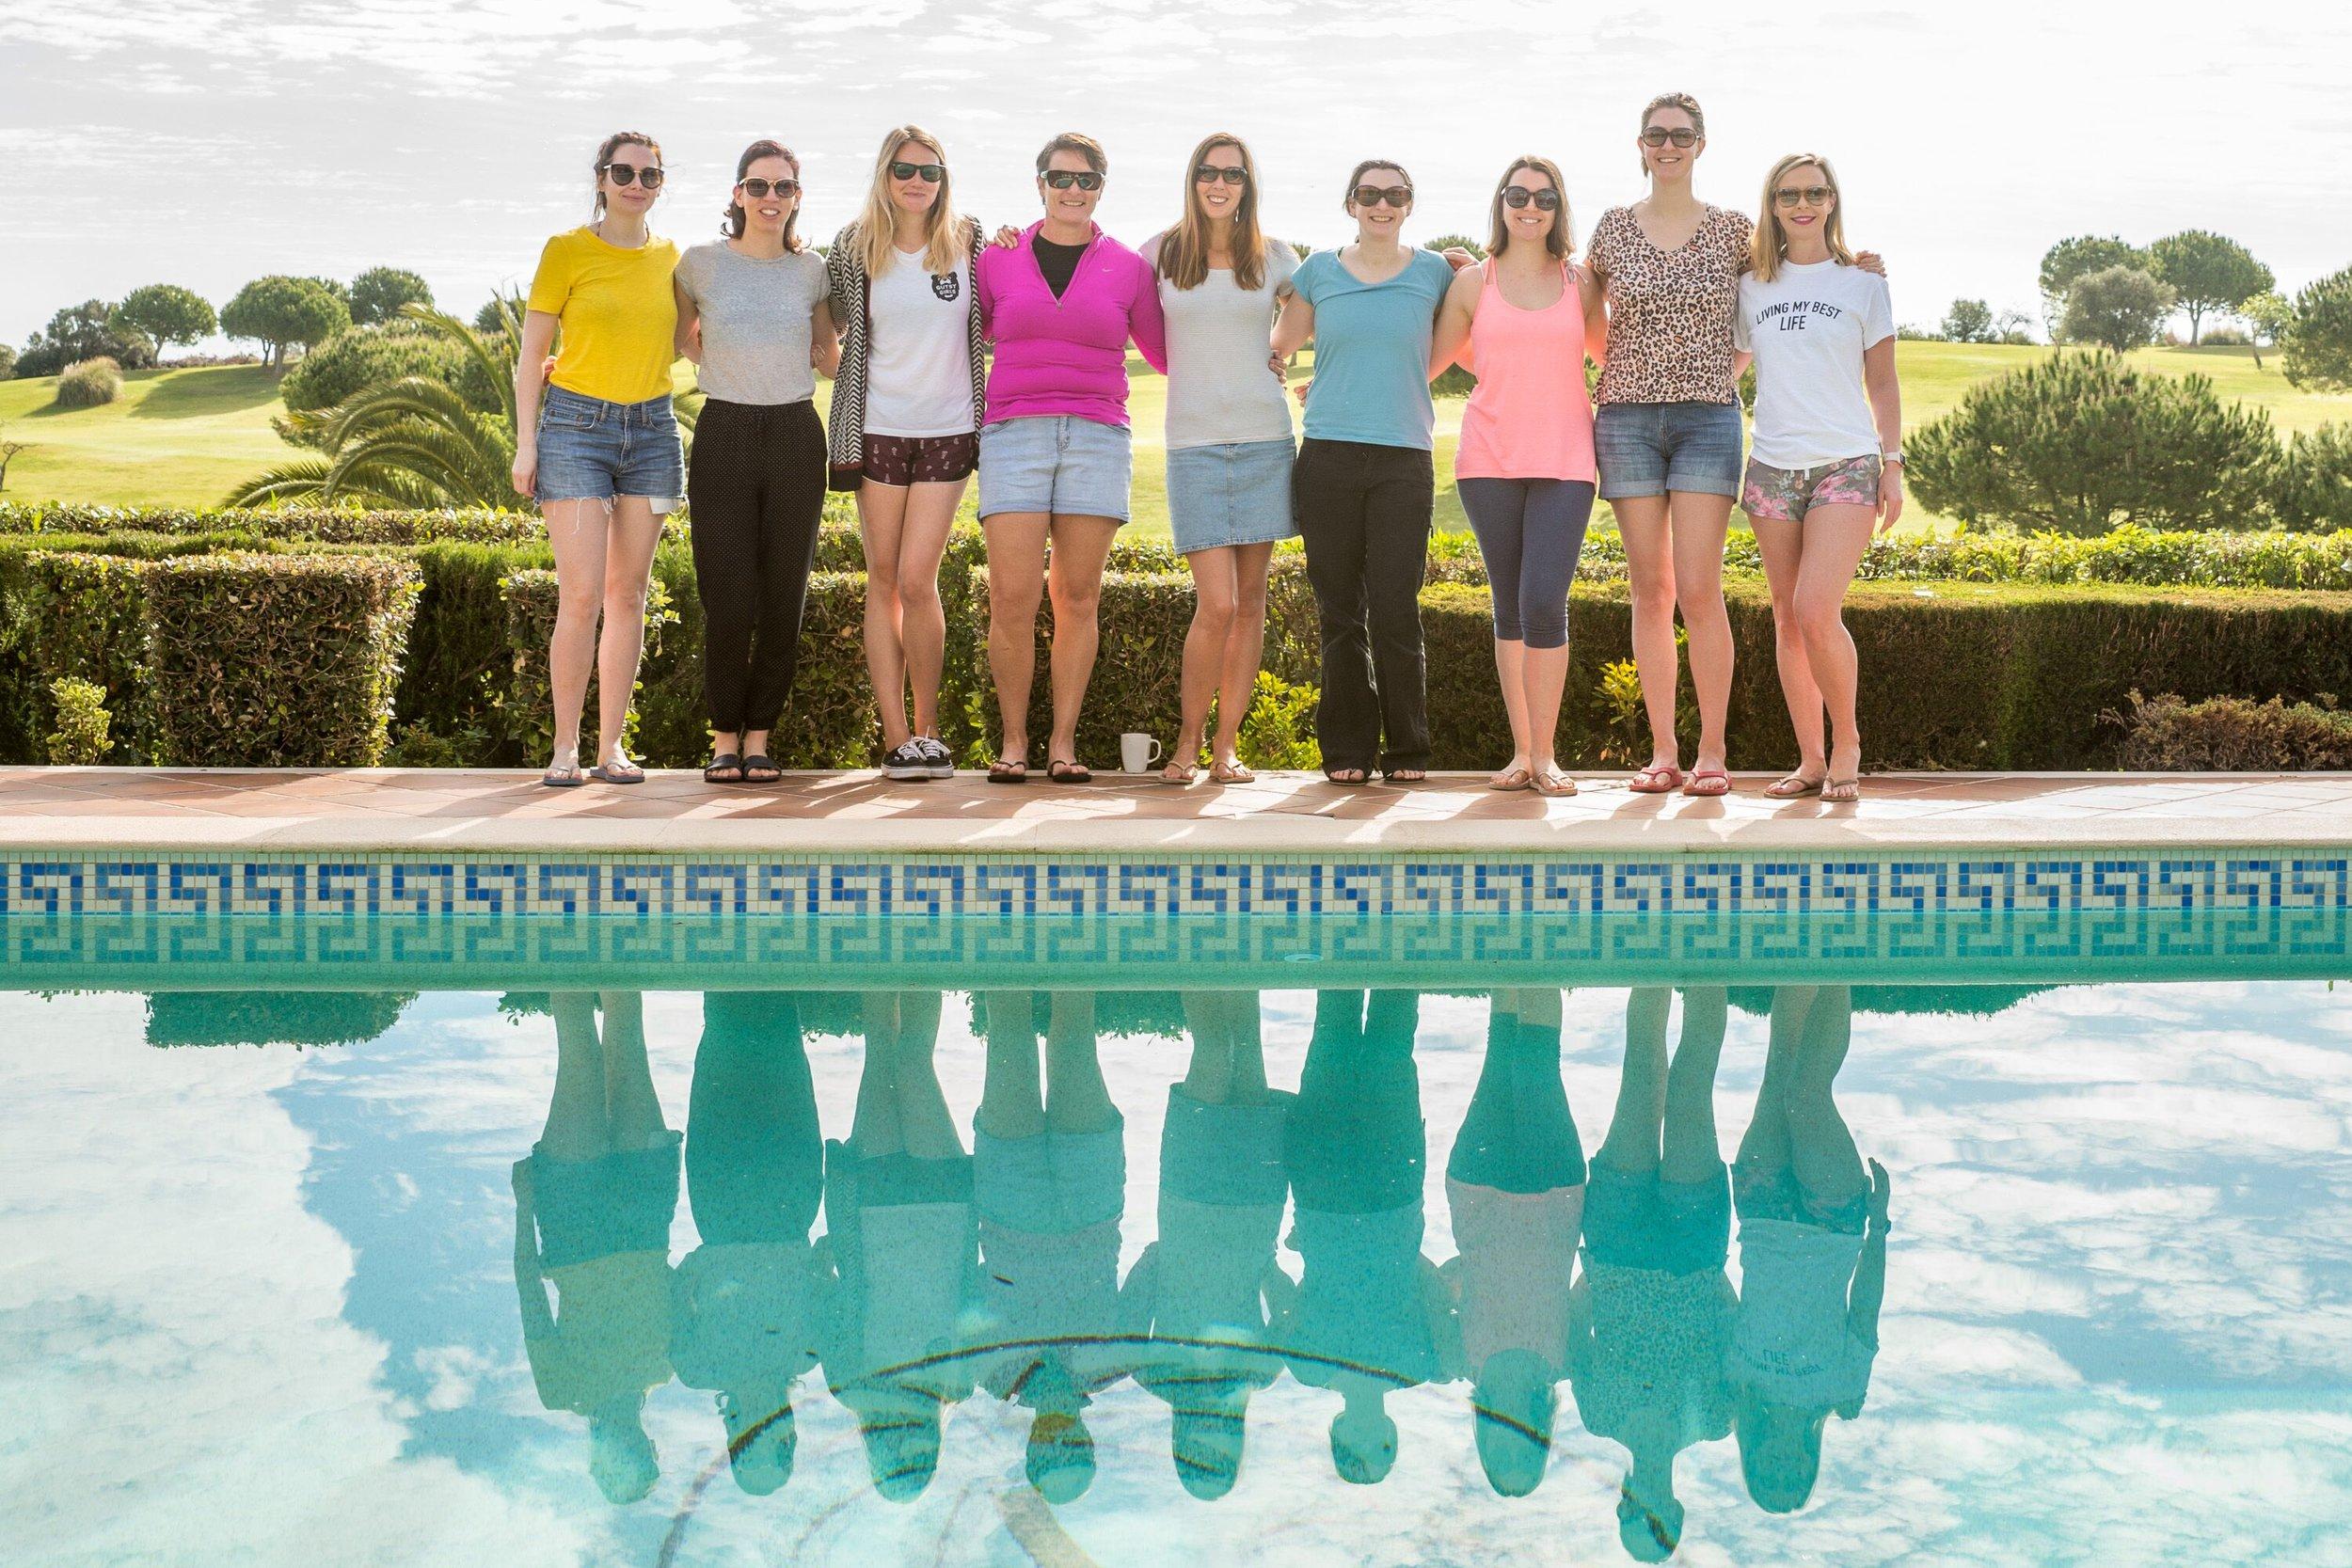 ride-on-retreats-ladies.jpg